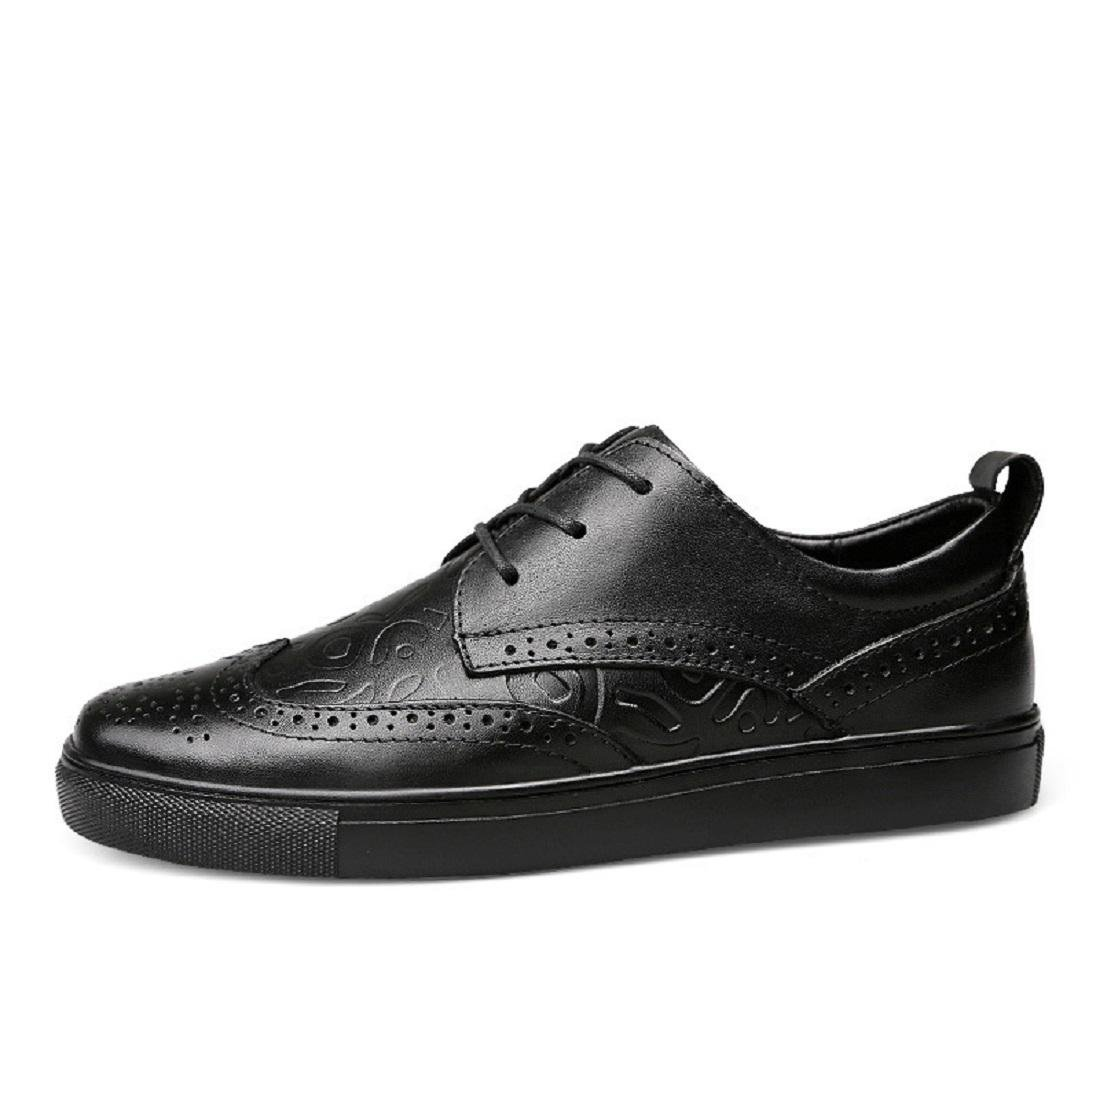 Herren Herbst Winter Das neue Geschäft Lederschuhe Formelle Kleidung Schuhe Atmungsaktiv Flache Schuhe Große Größe EUR GRÖSSE 38-47